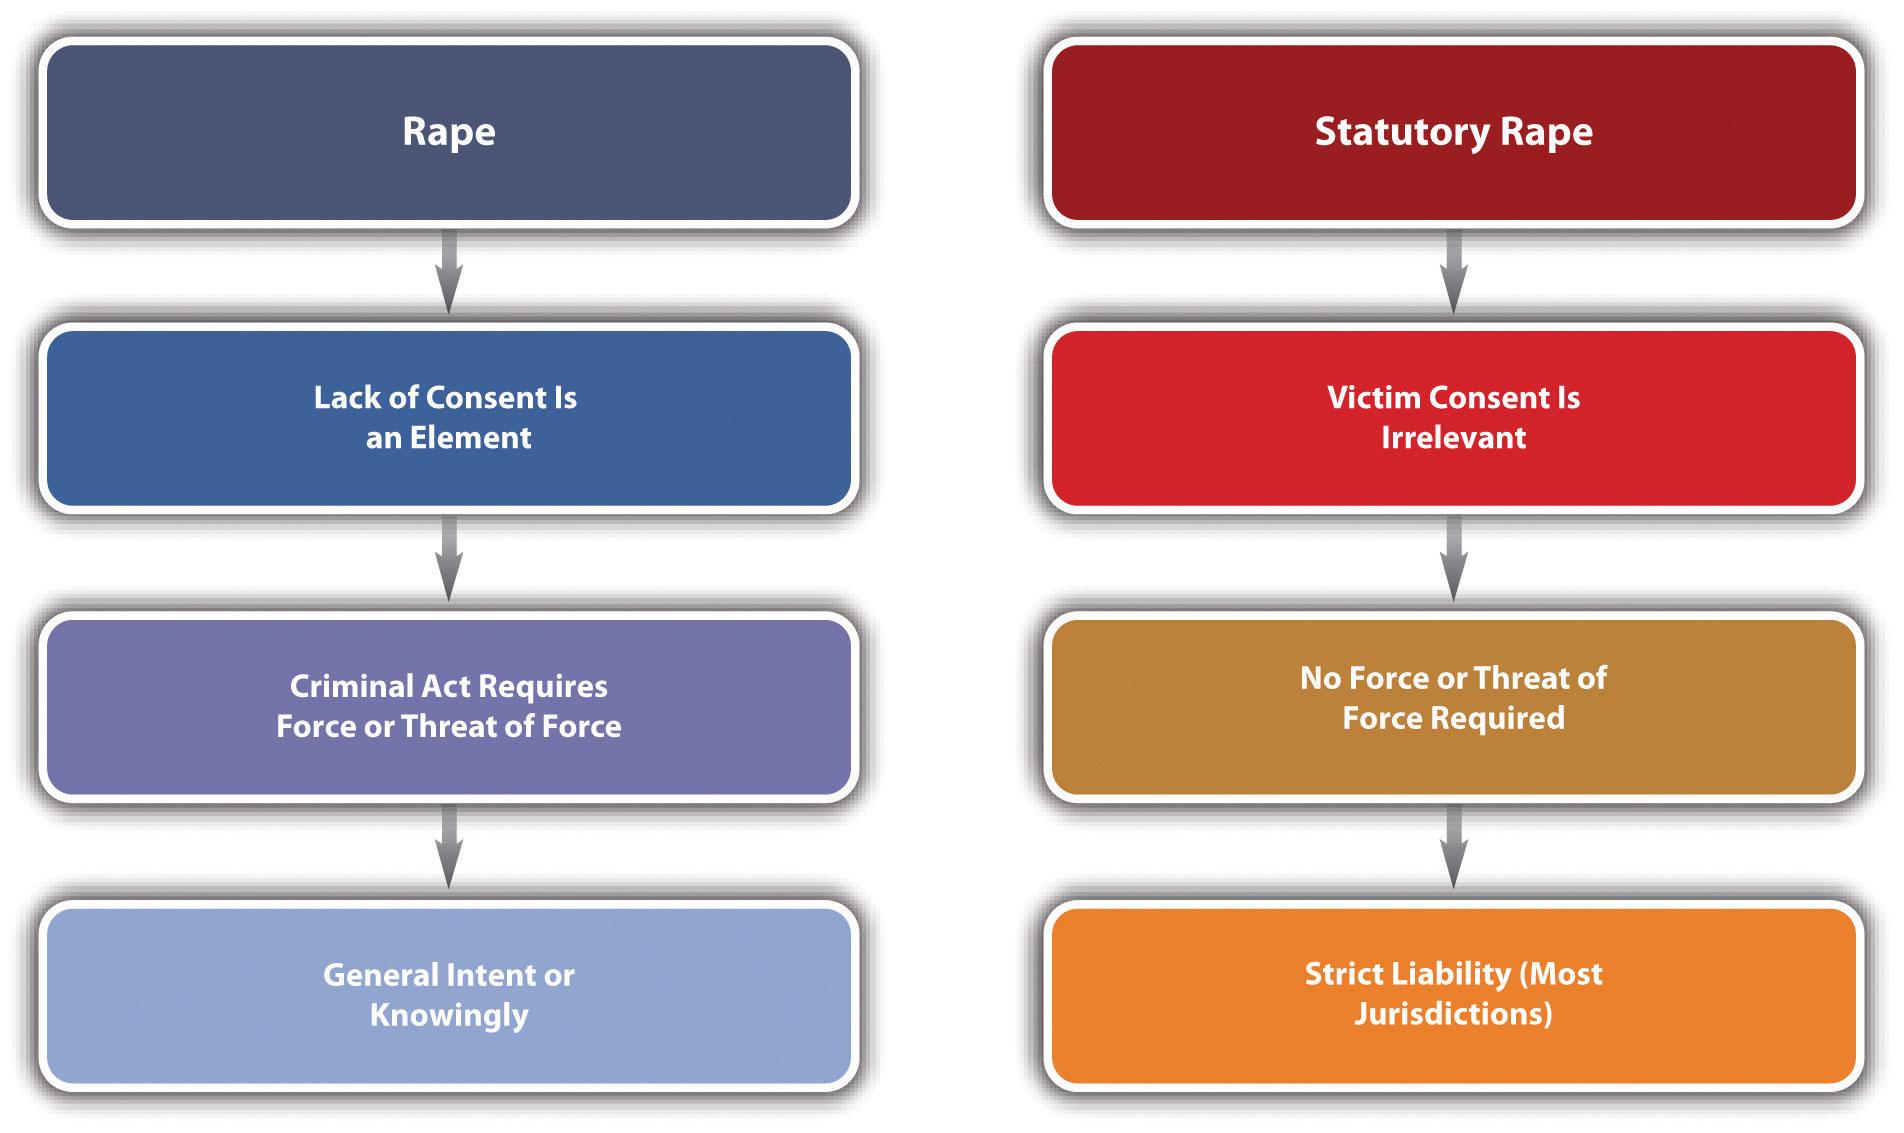 Comparison of Rape and Statutory Rape